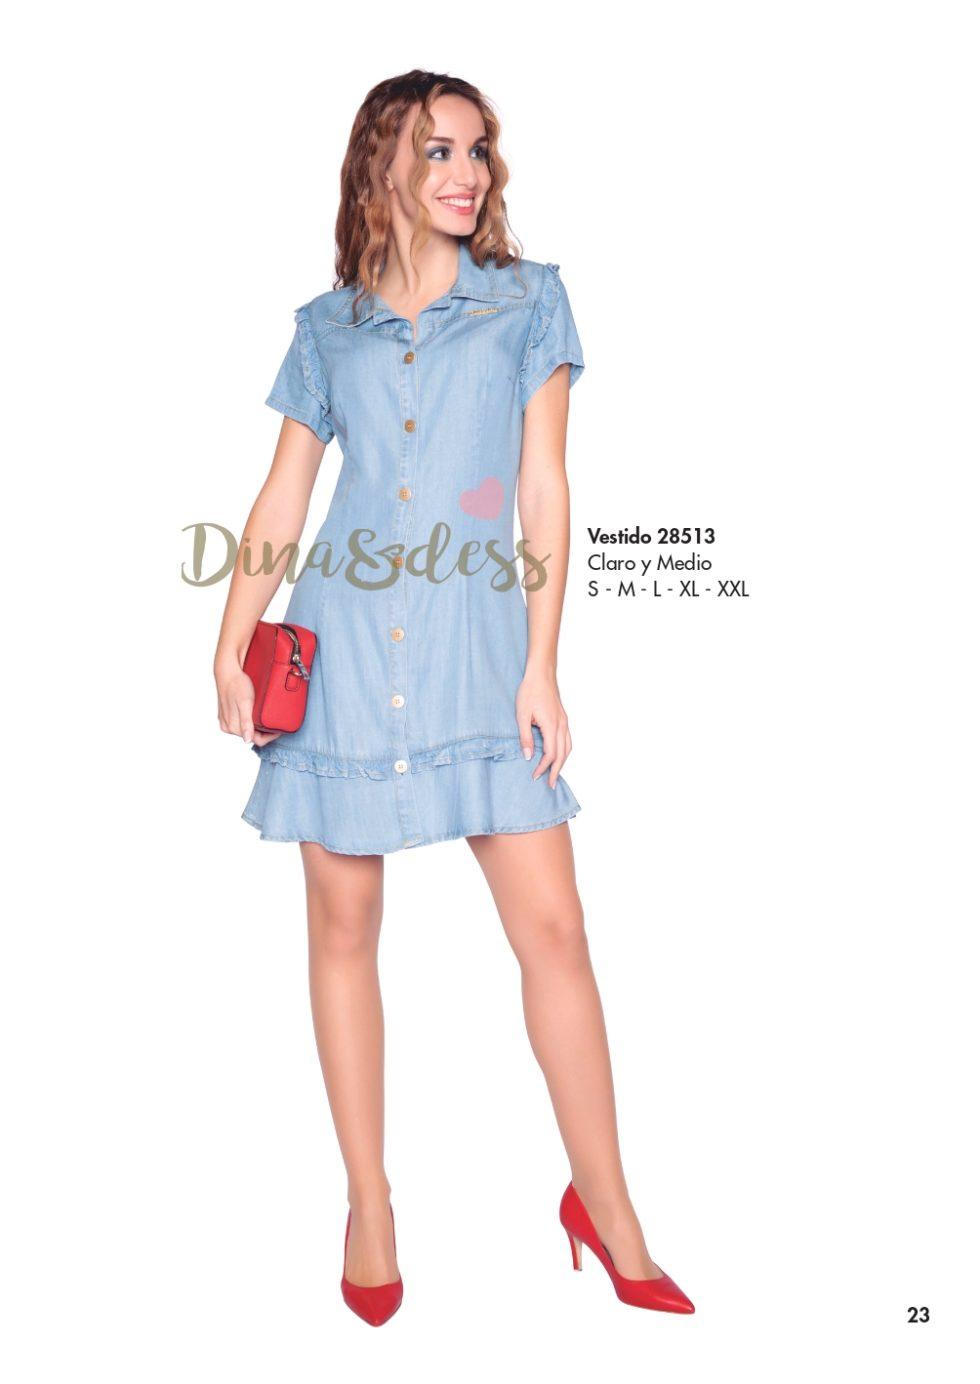 Verano 2021 Dina&Dess Clientes_page-0025